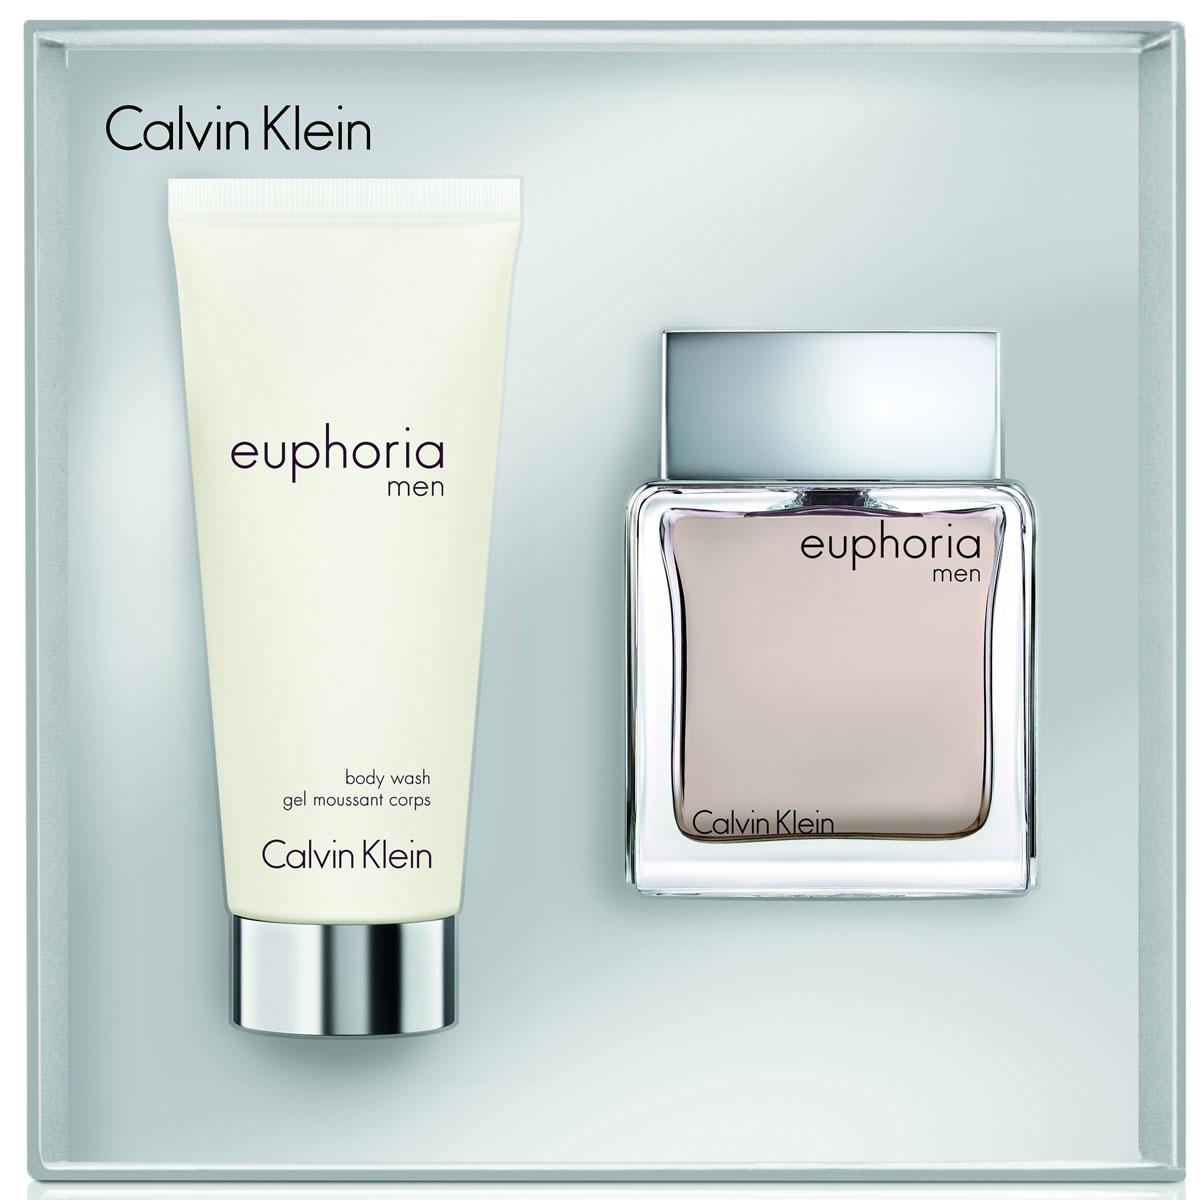 Calvin Klein Euphoria For Man Подарочный набор мужской: Туалетная вода, 50 мл + гель для душа 100 мл65224787000